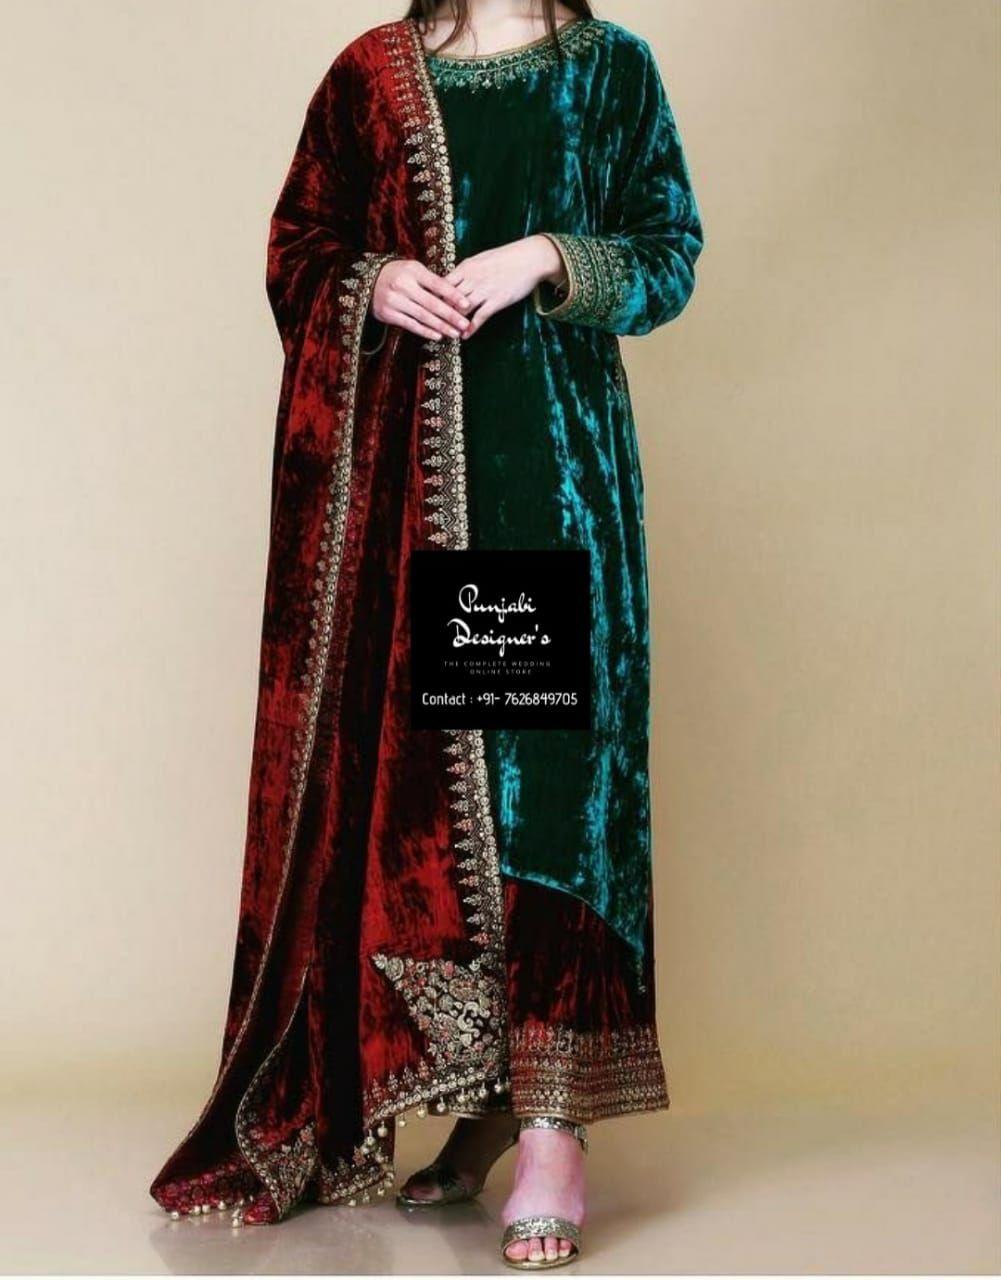 Buy Punjabi Suit Online India Buy Punjabi Suit Online Malaysia Buy Punjabi Suit Online Canada Velvet Dress Designs Punjabi Suits Designer Boutique Party Wear